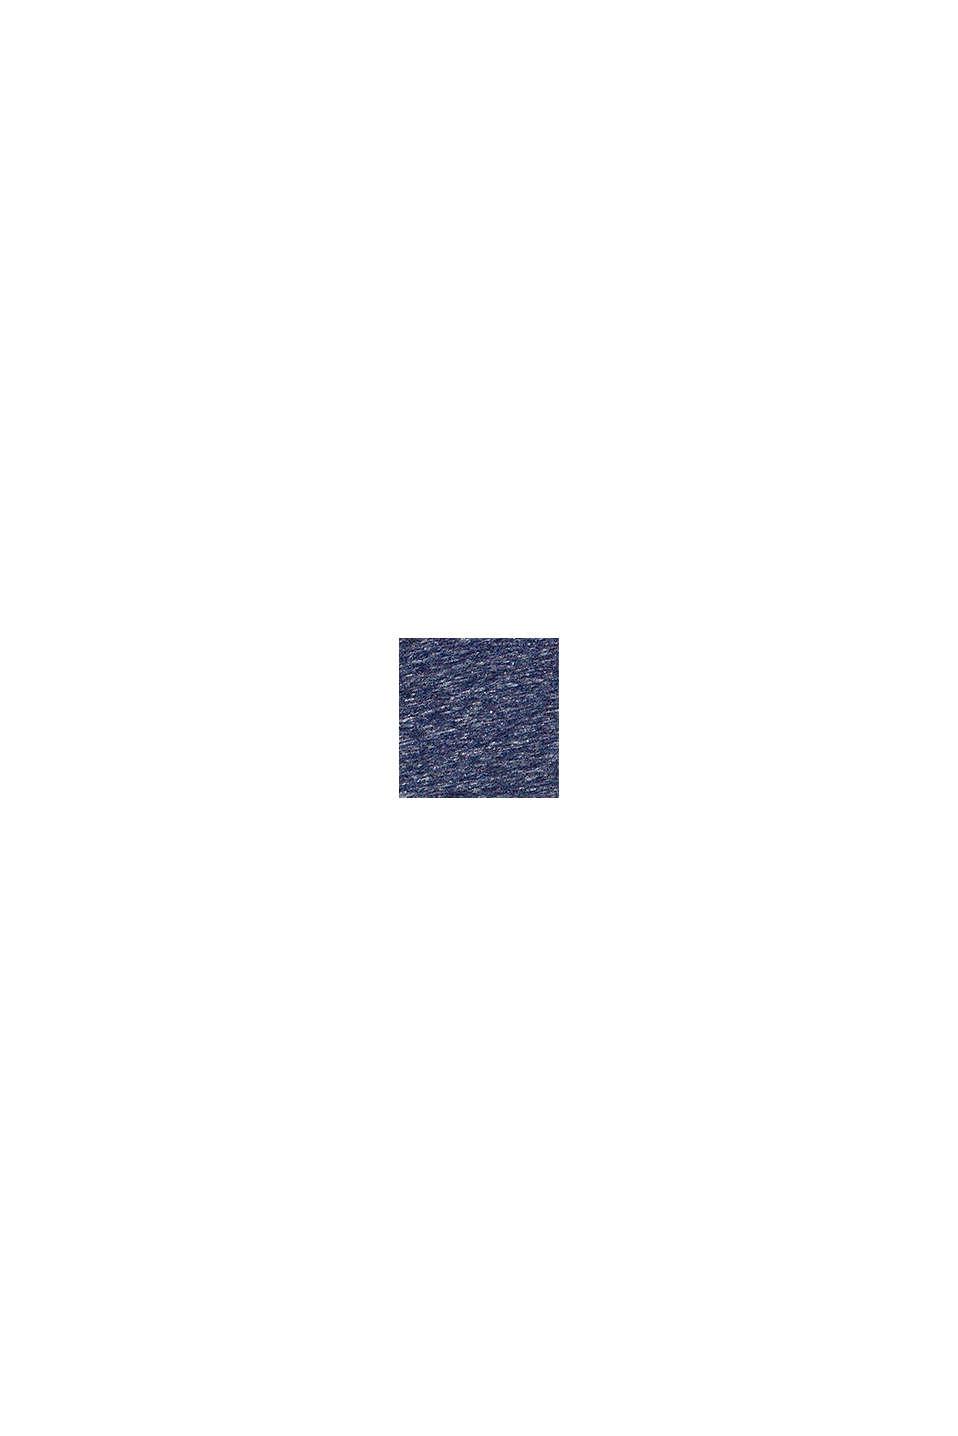 Gemêleerd T-shirt met cactusprint, PETROL BLUE, swatch